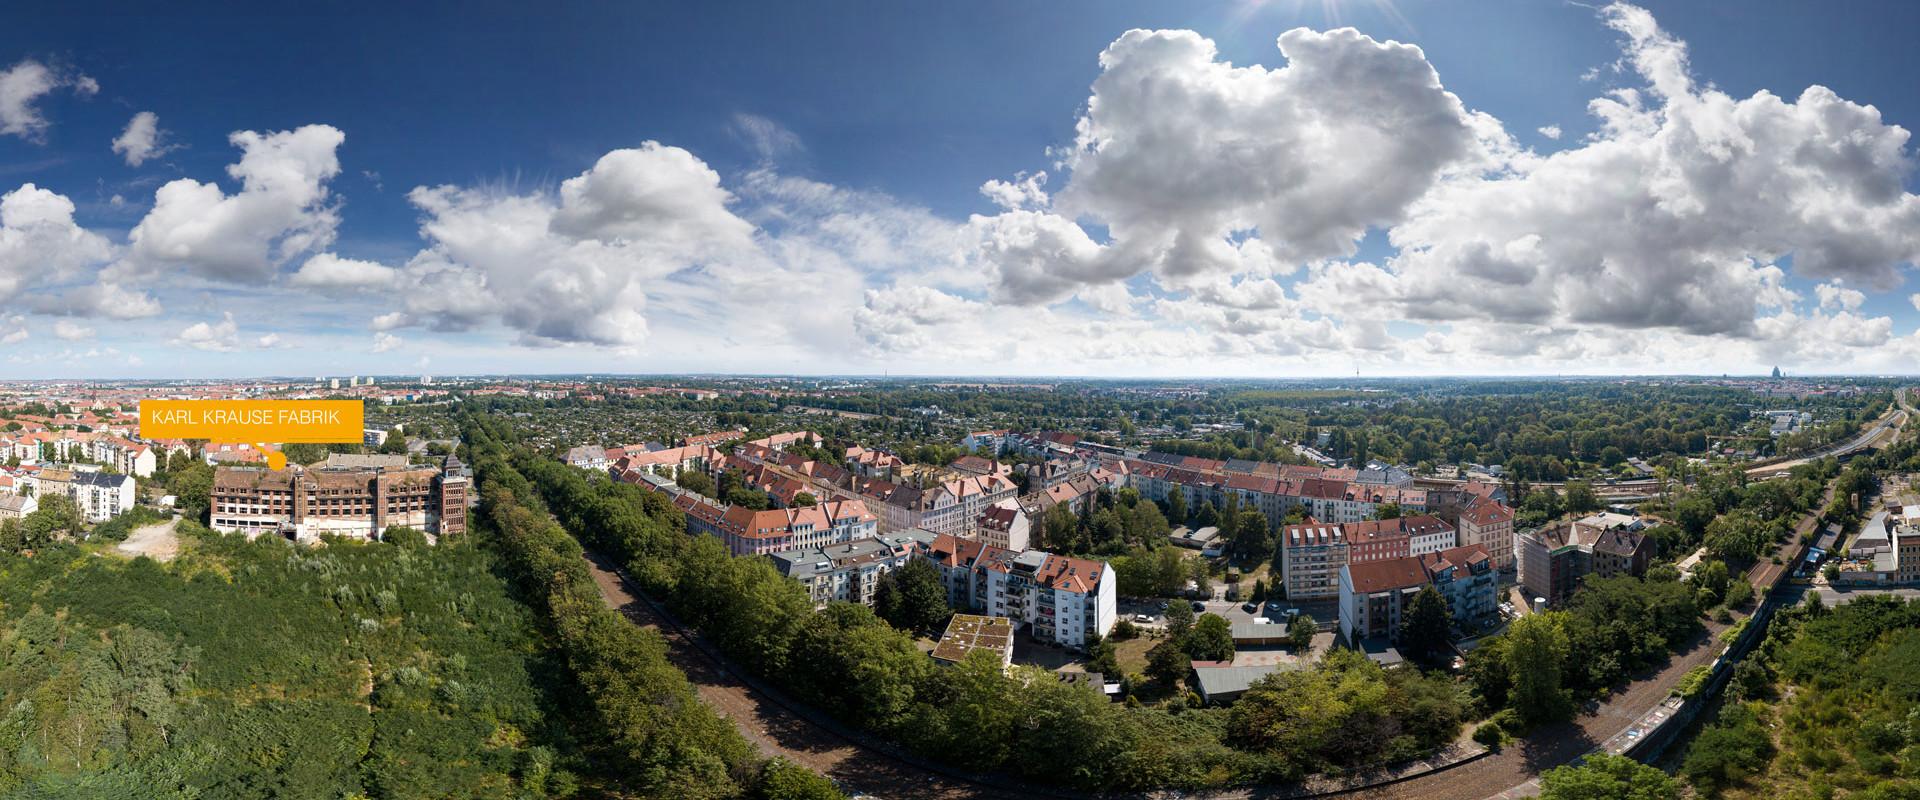 karl-krause-fabrik-leipzig-immobilie-in-anger-crottendorf-panorama-rueckseite